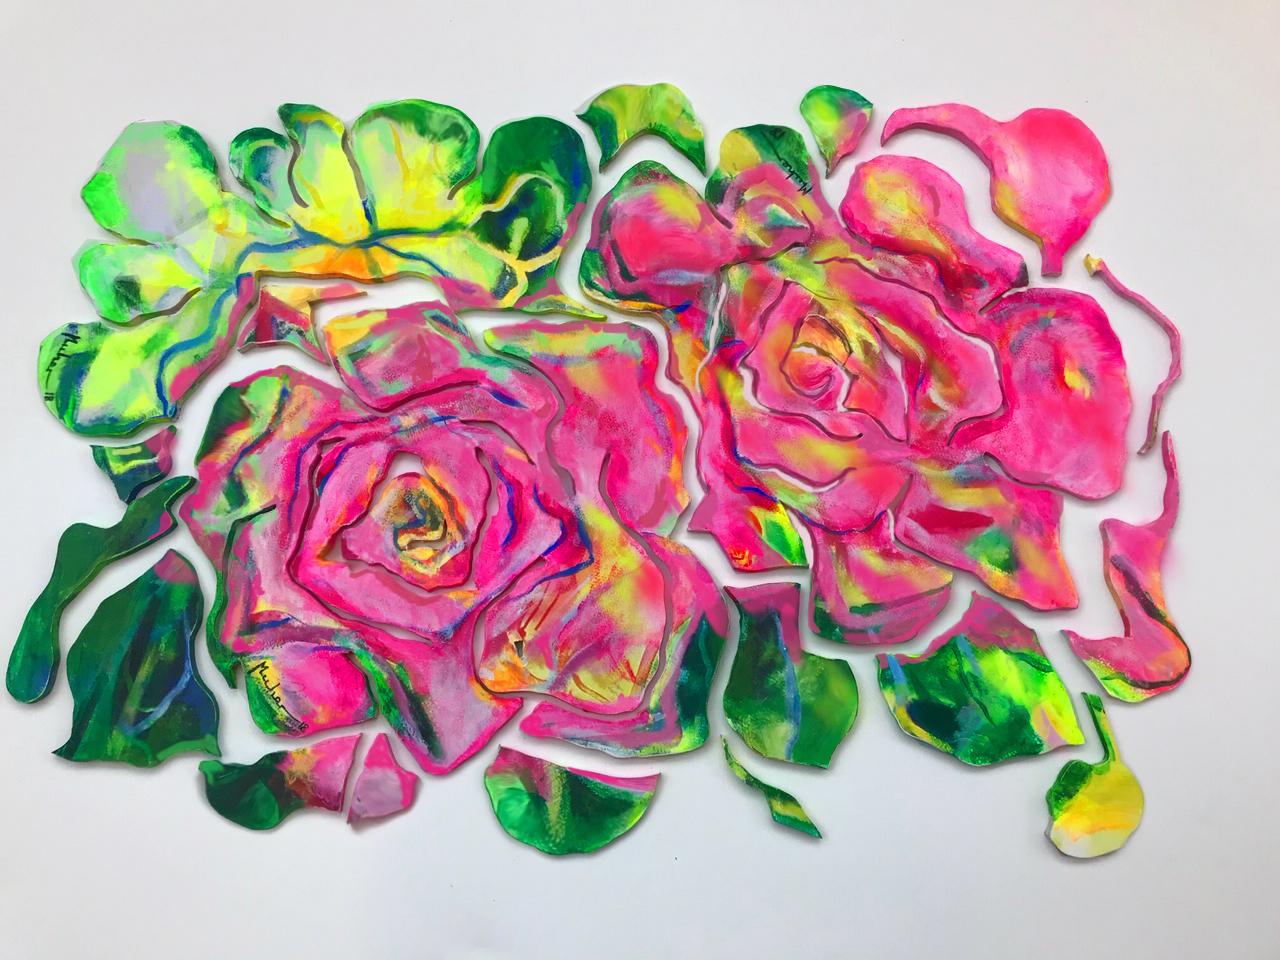 rosas deconstruidas . obra tecnica mixta . acrliico y resina sobre madera